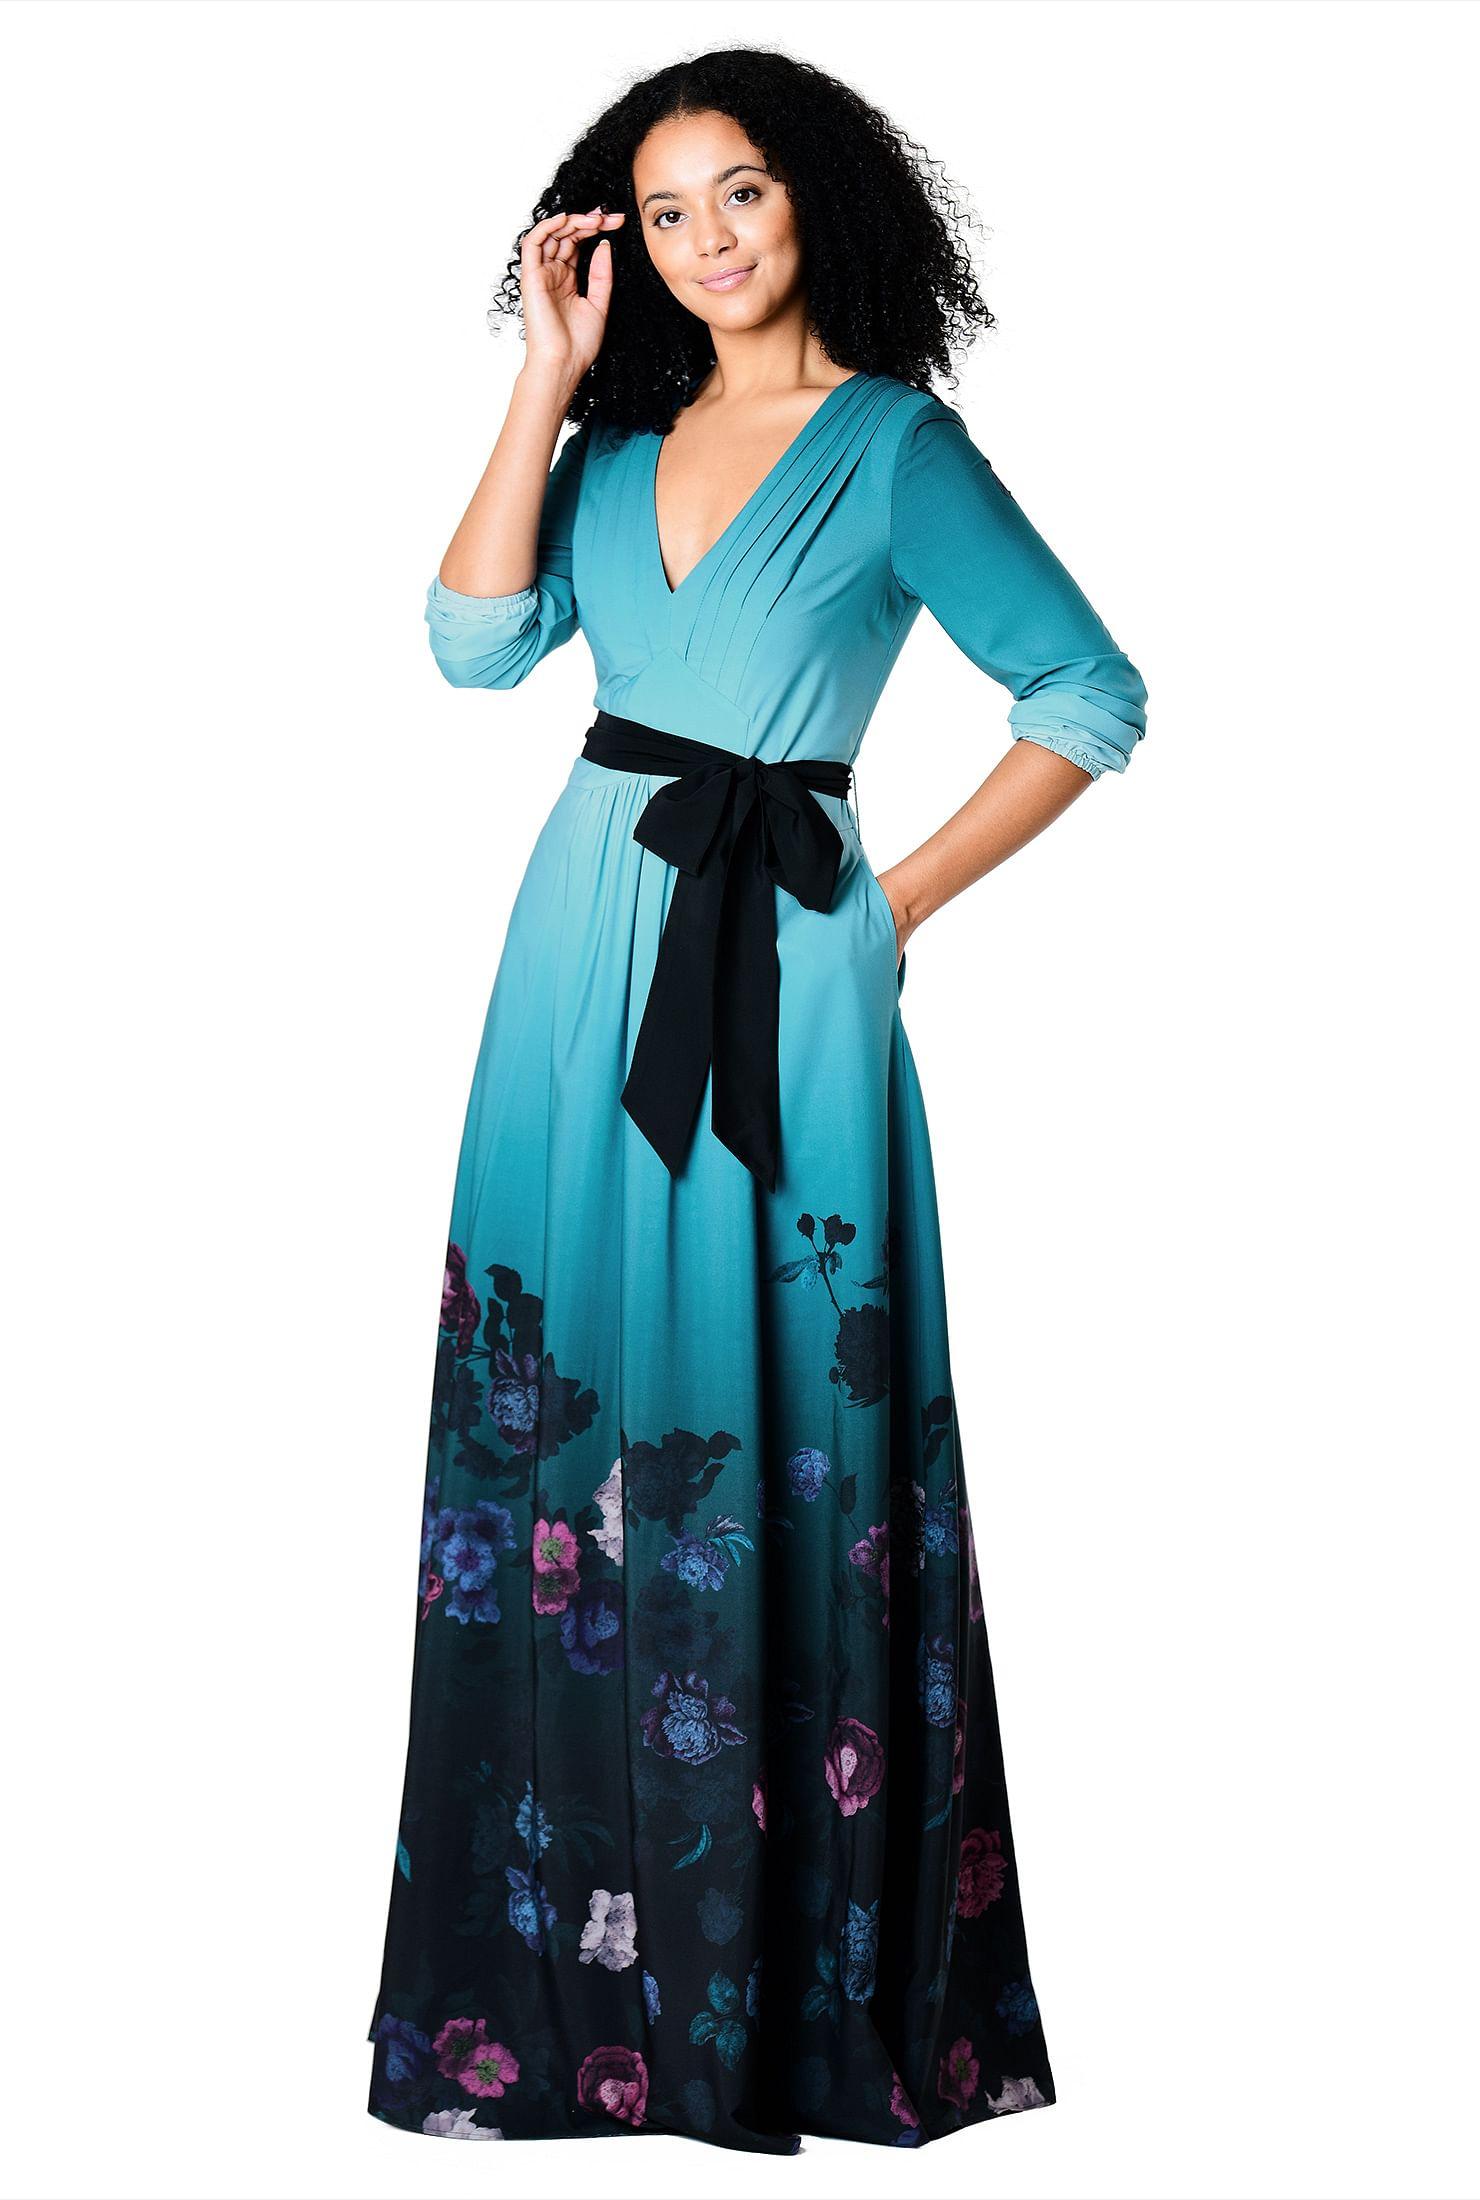 16601ce5e6e ... Pleated floral ombre print crepe maxi dress. Out of Stock. , back zip  dresses, blouson sleeve dresses, crepe dresses, empire dresses, empire